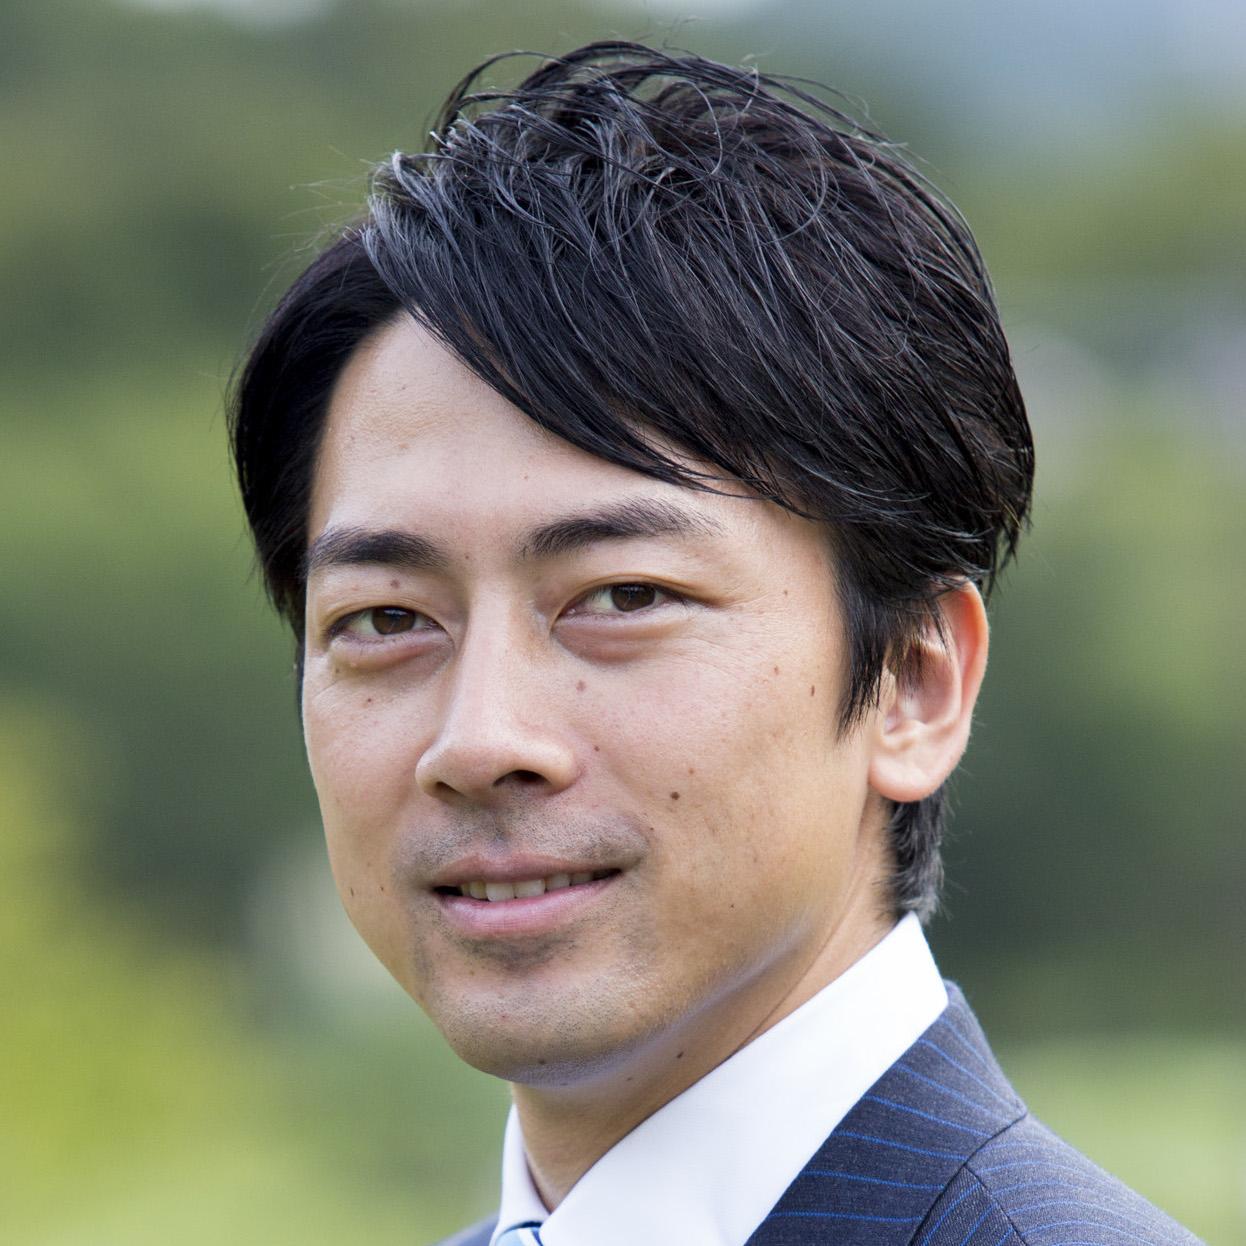 http://stat.profile.ameba.jp/profile_images/20151114/22/5a/zF/j/o124612461447506293929.jpg